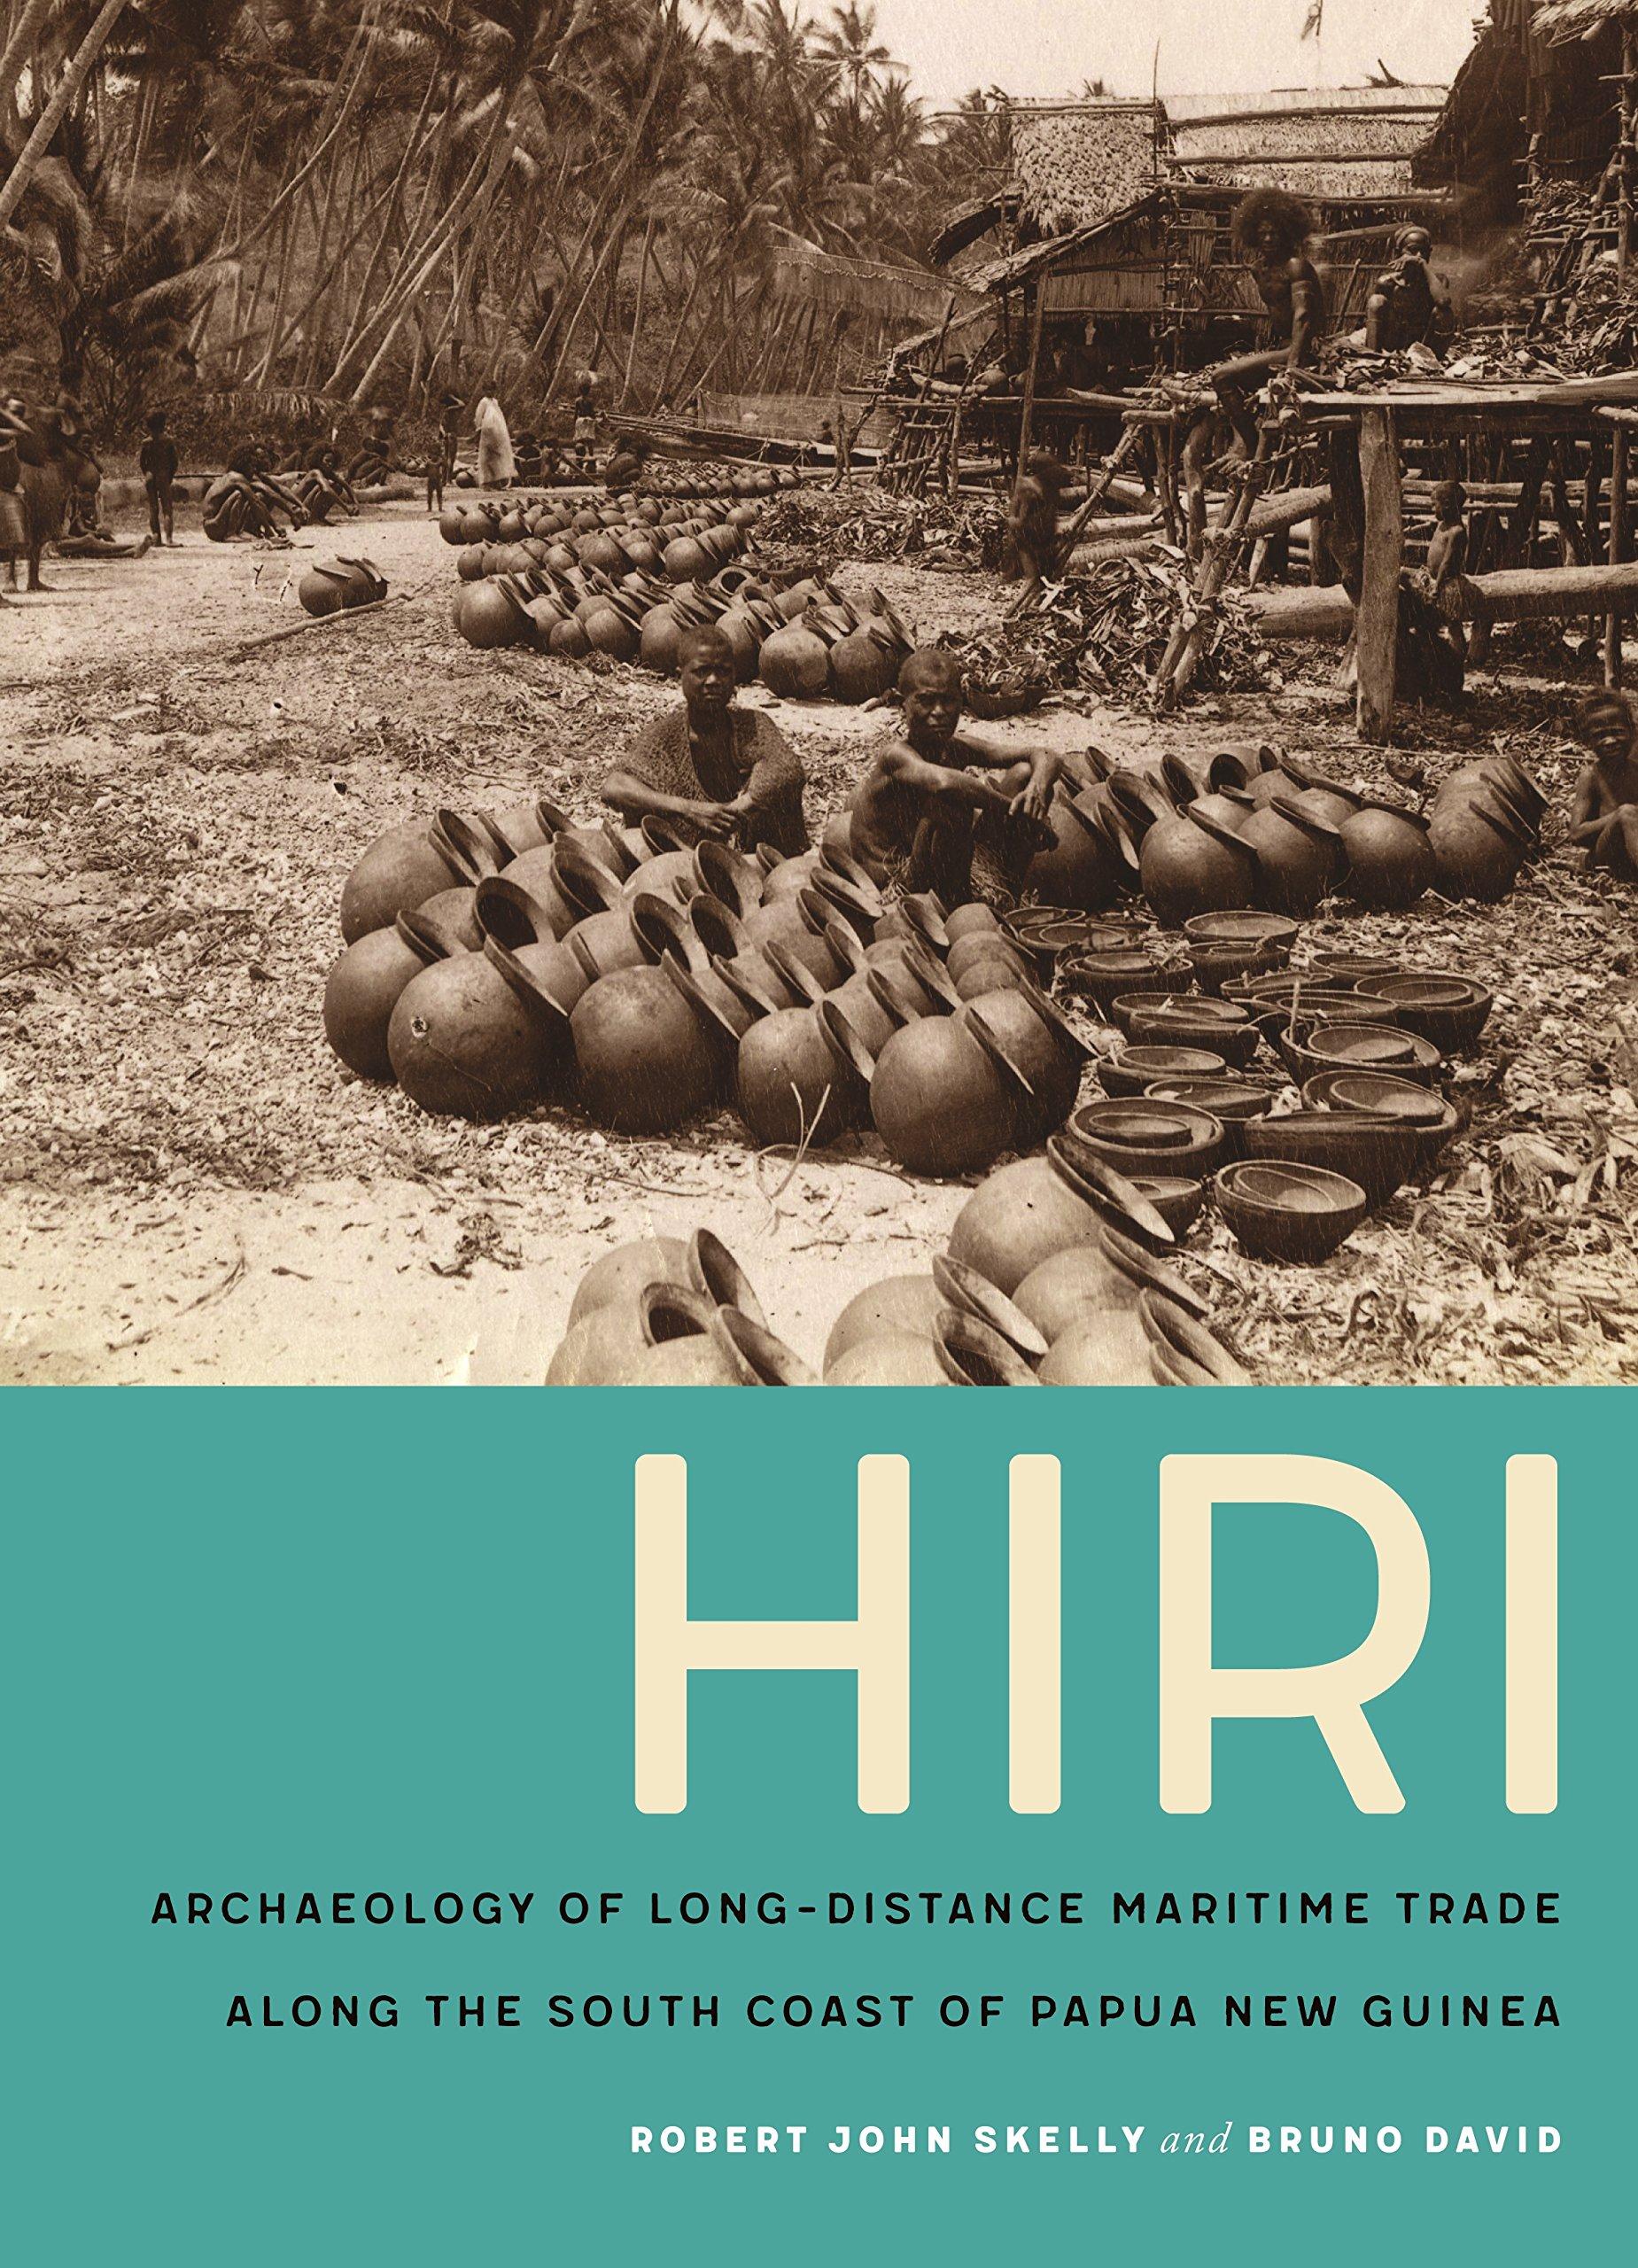 Hiri: Archaeology of Long-Distance Maritime Trade along the South Coast of Papua New Guinea